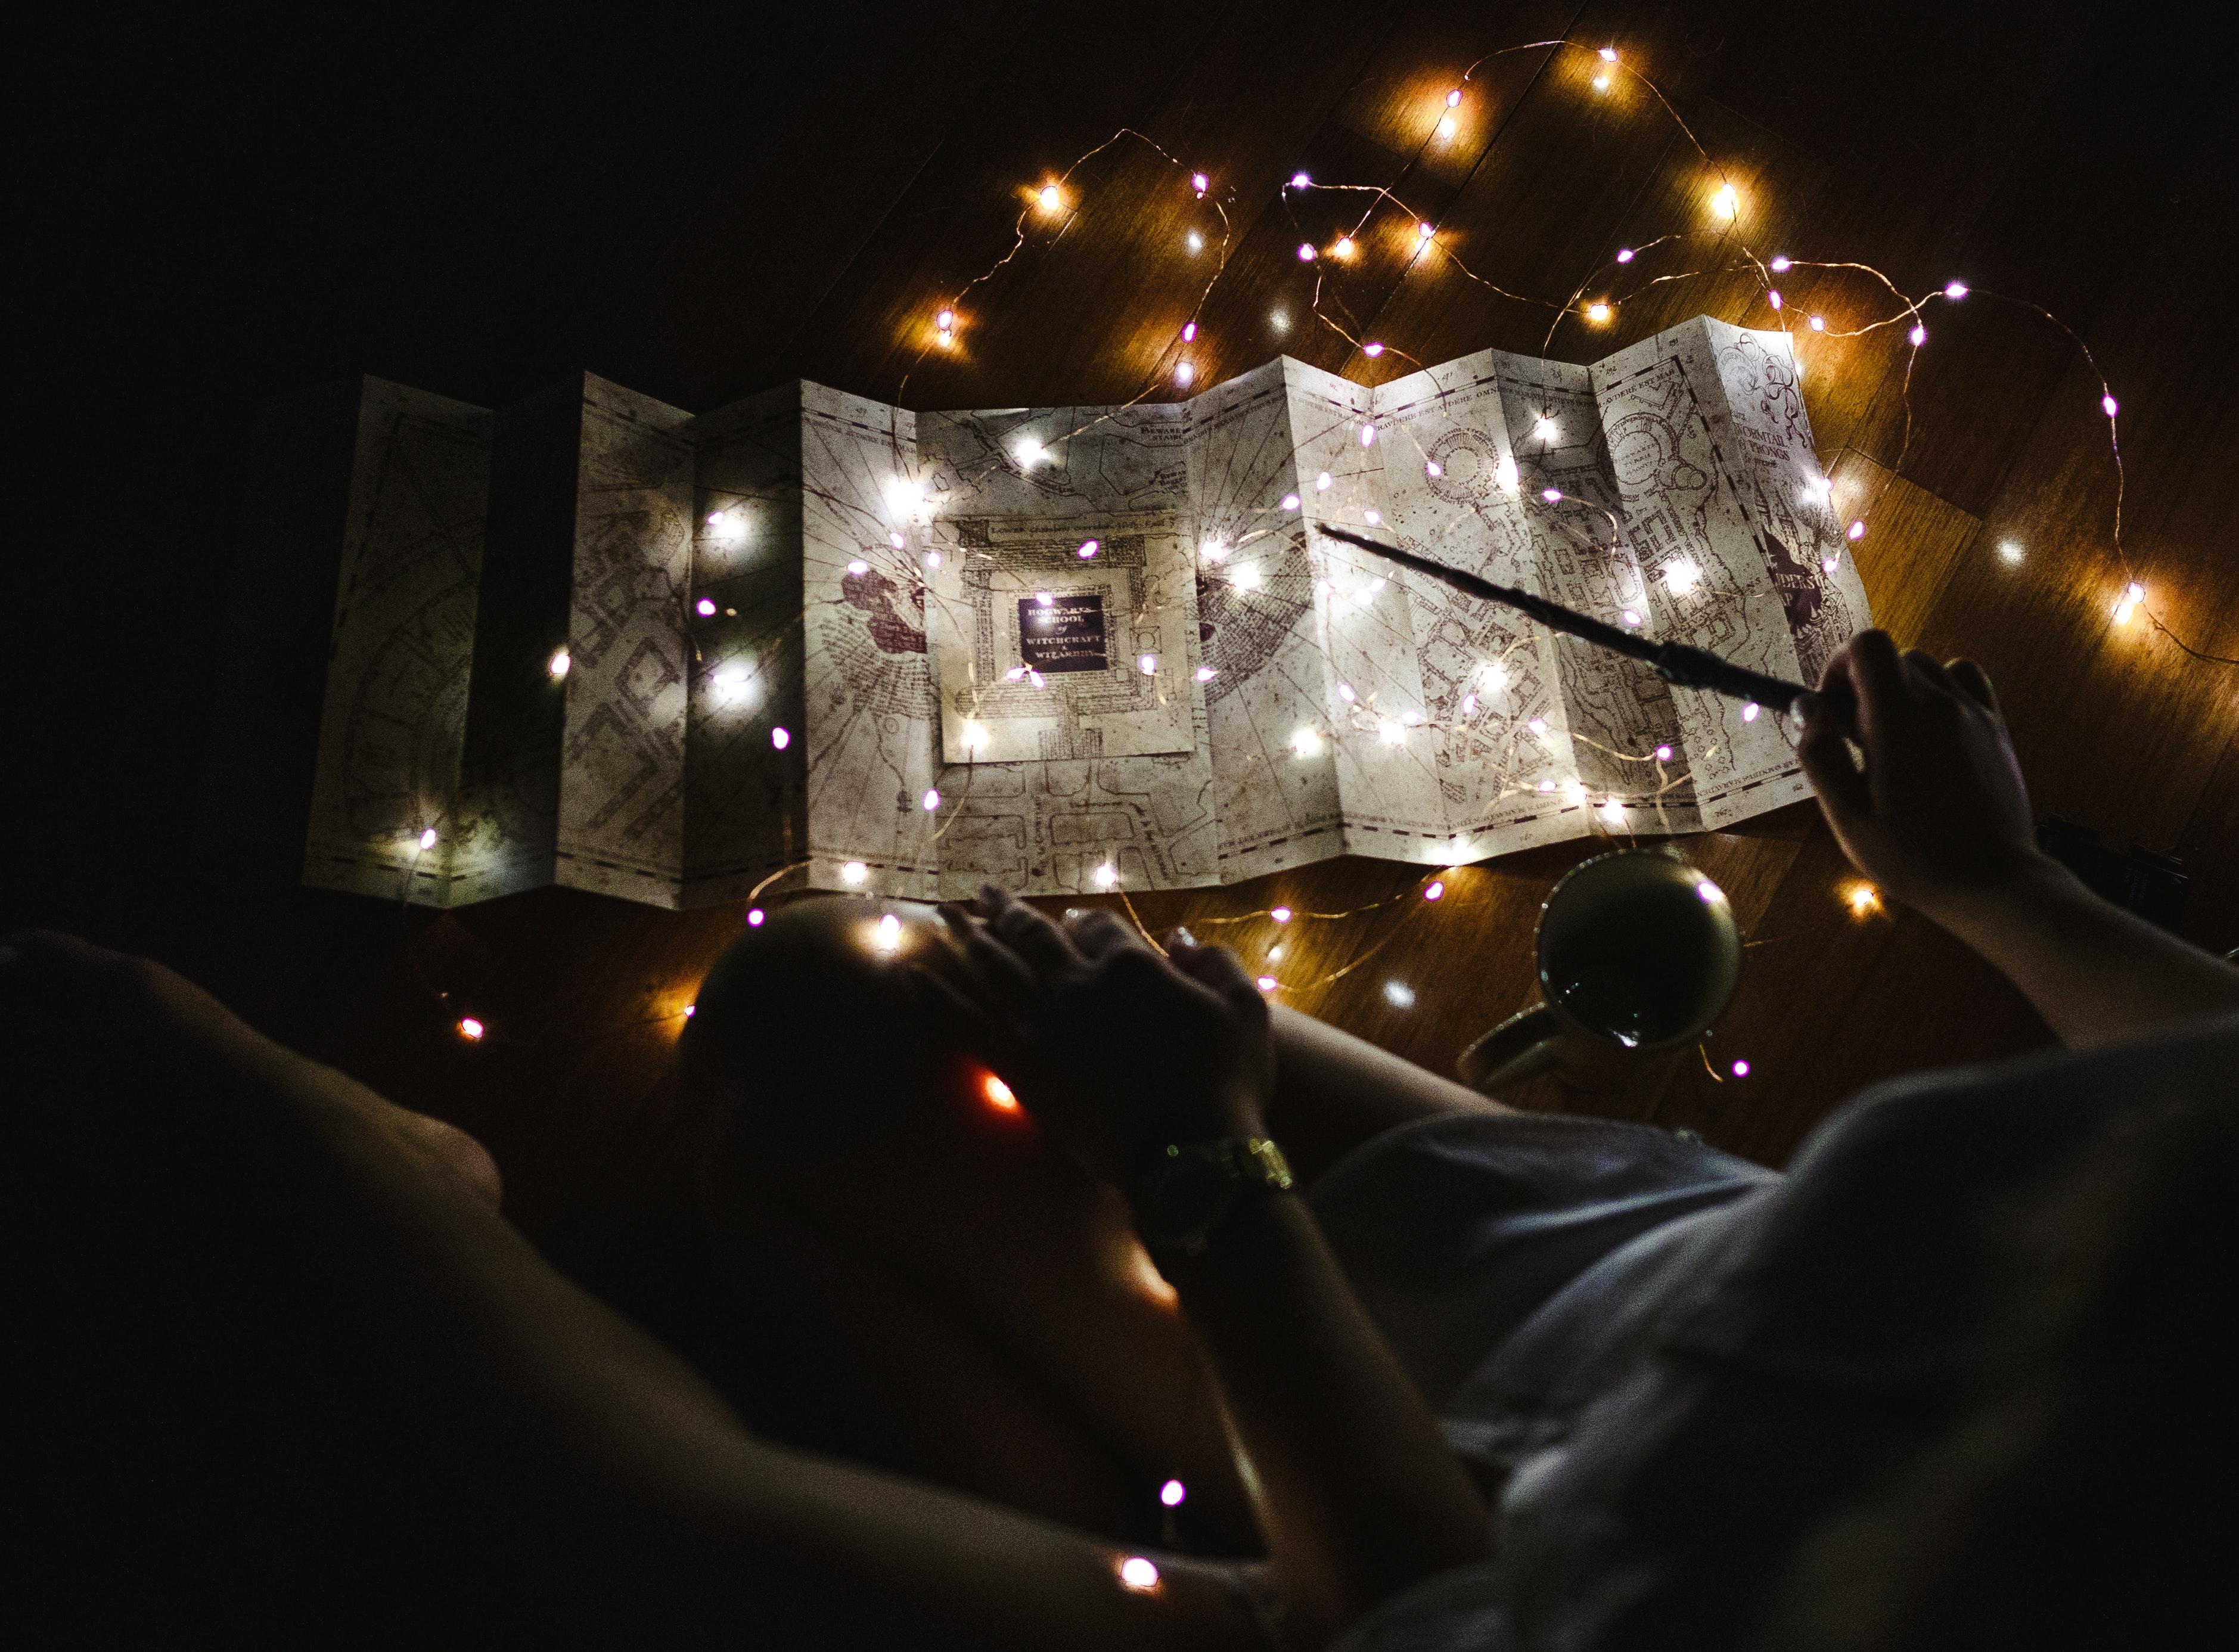 Free stock photo of 4k wallpaper, christmas lights, harry potter